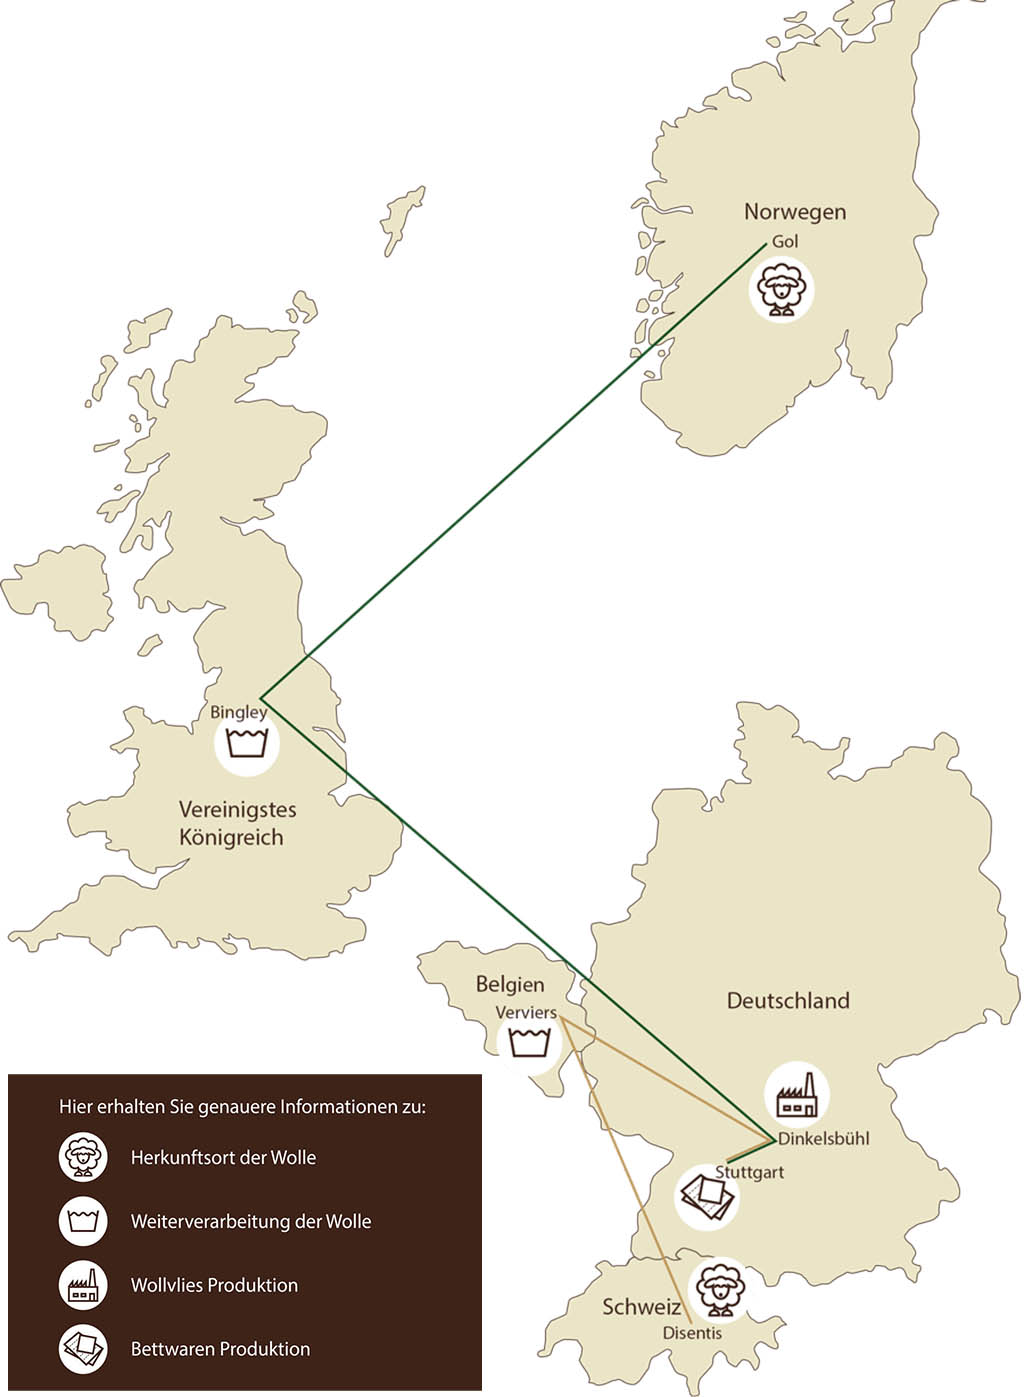 Centa-Star-Lavalan-Karte-Herkunftsorte-Wolle